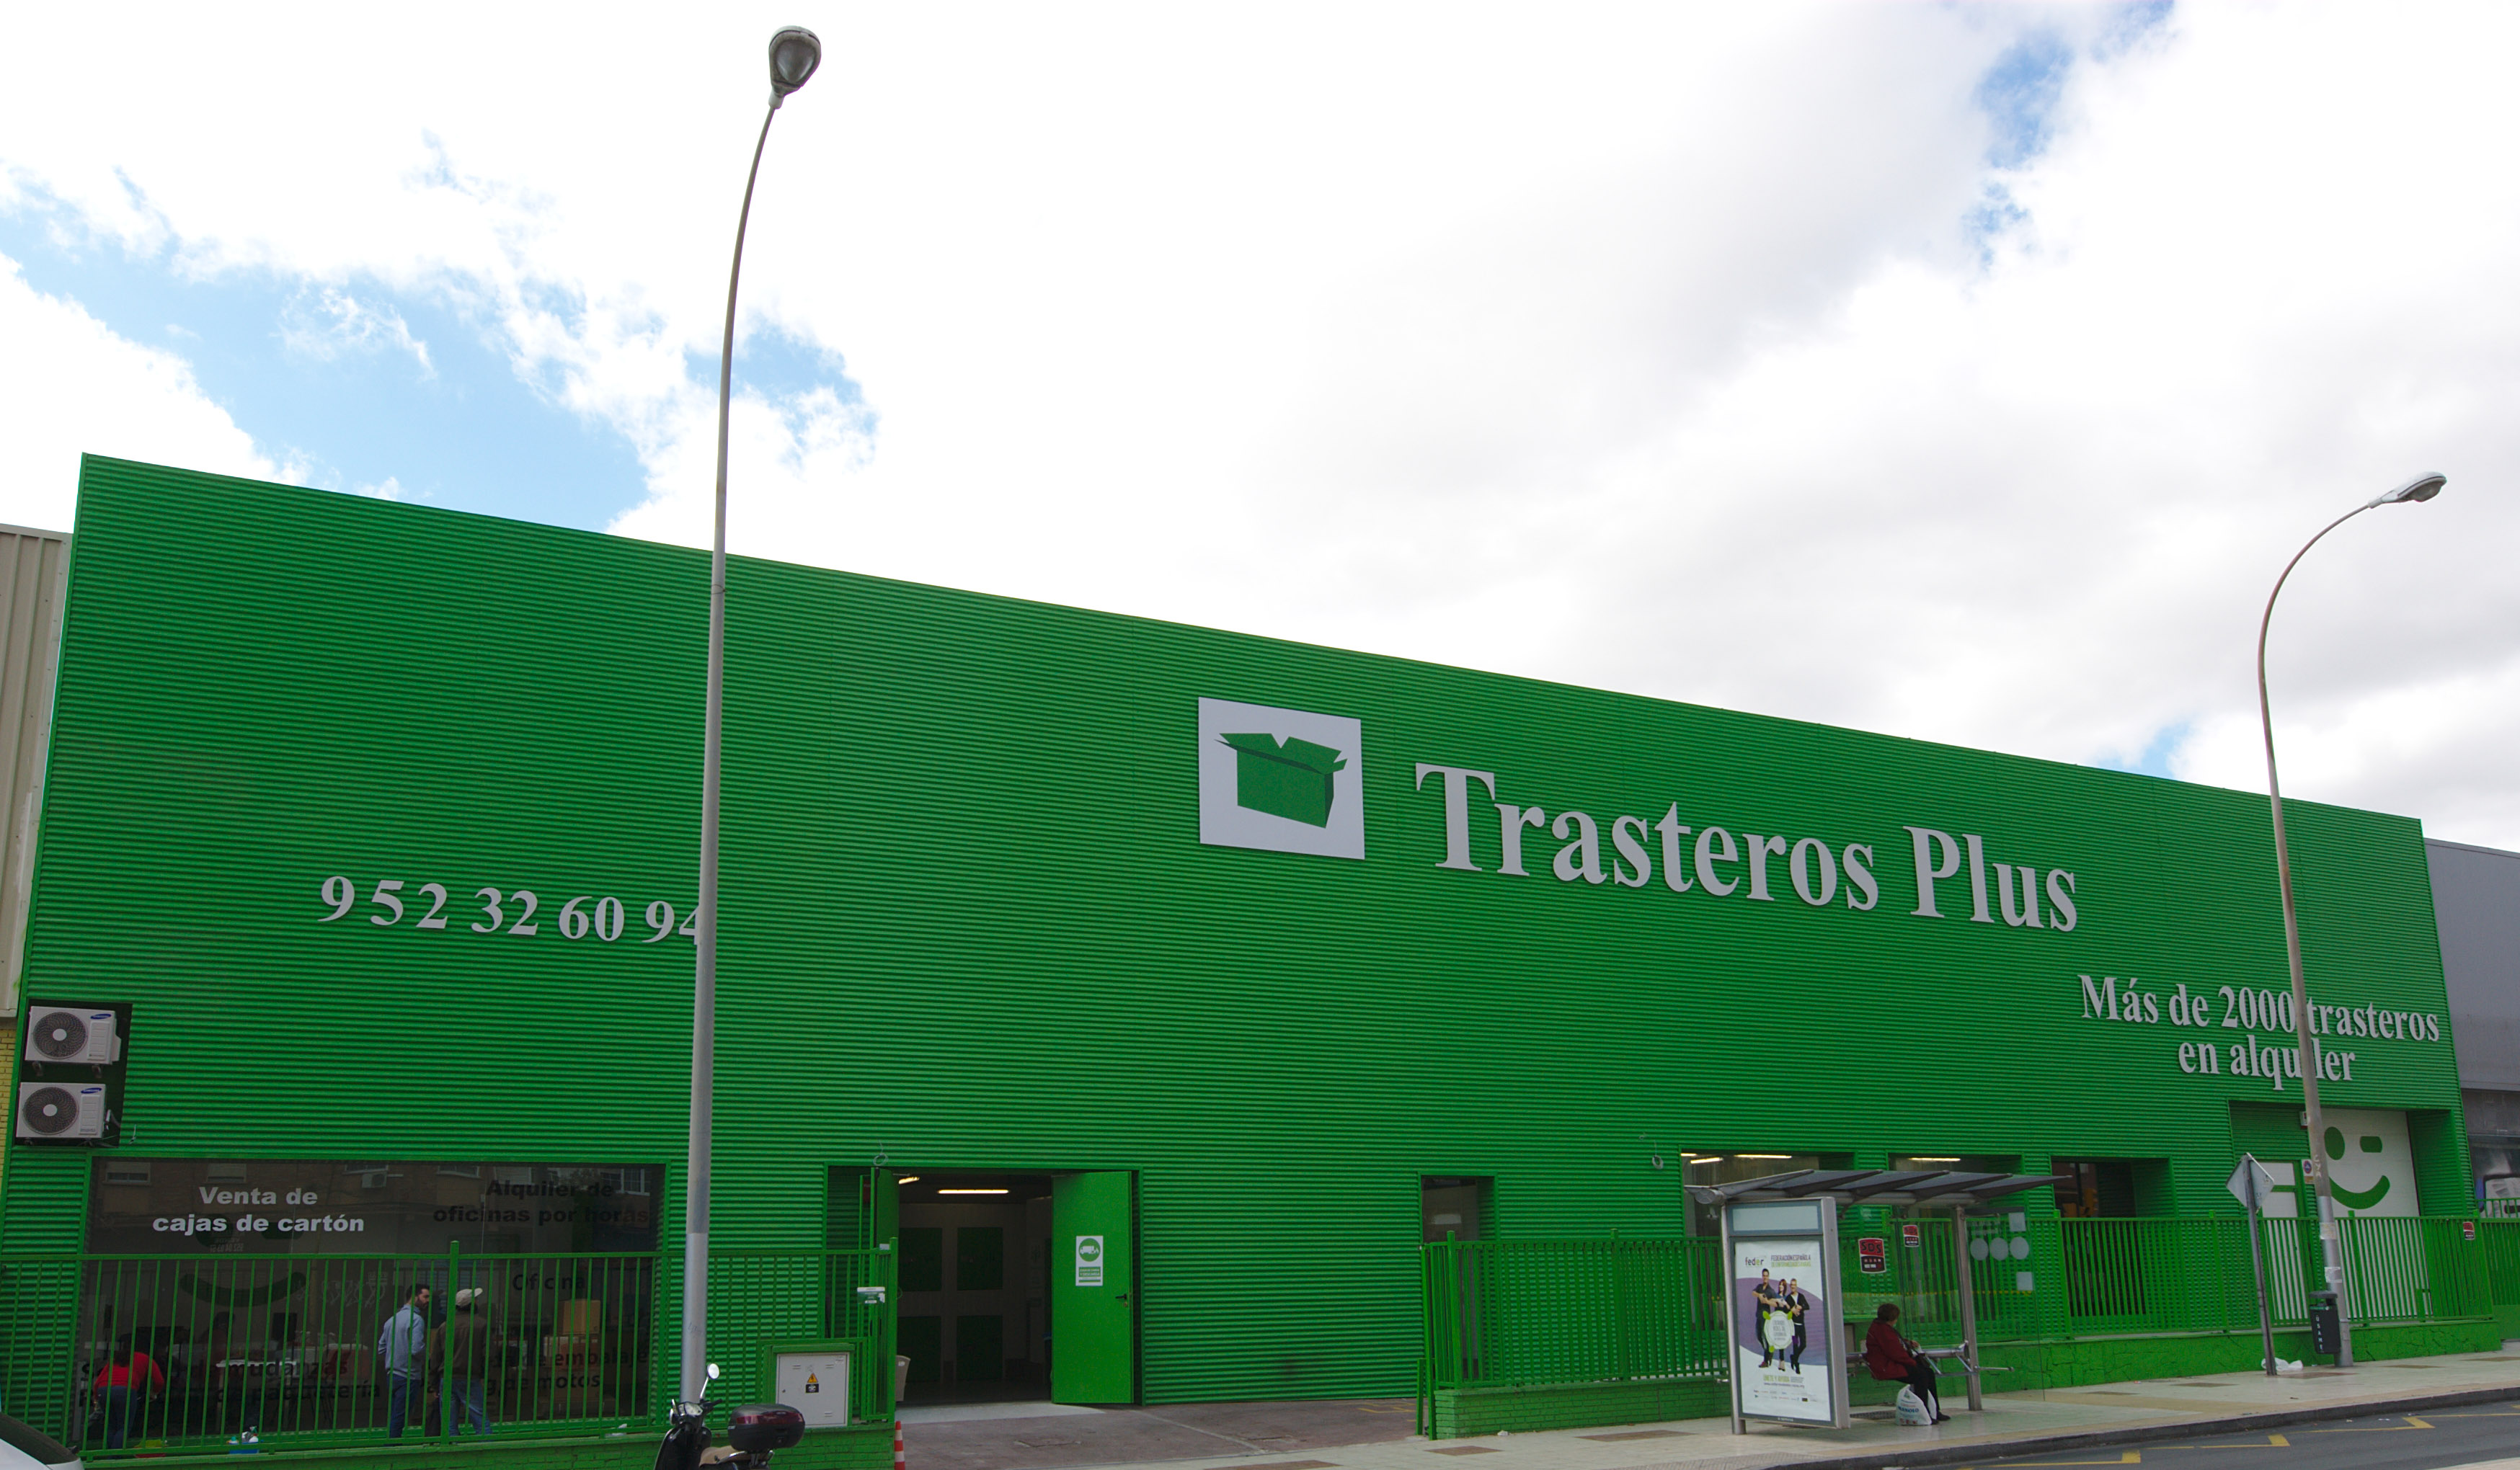 TrasterosPlus Avs. JuanXXIII